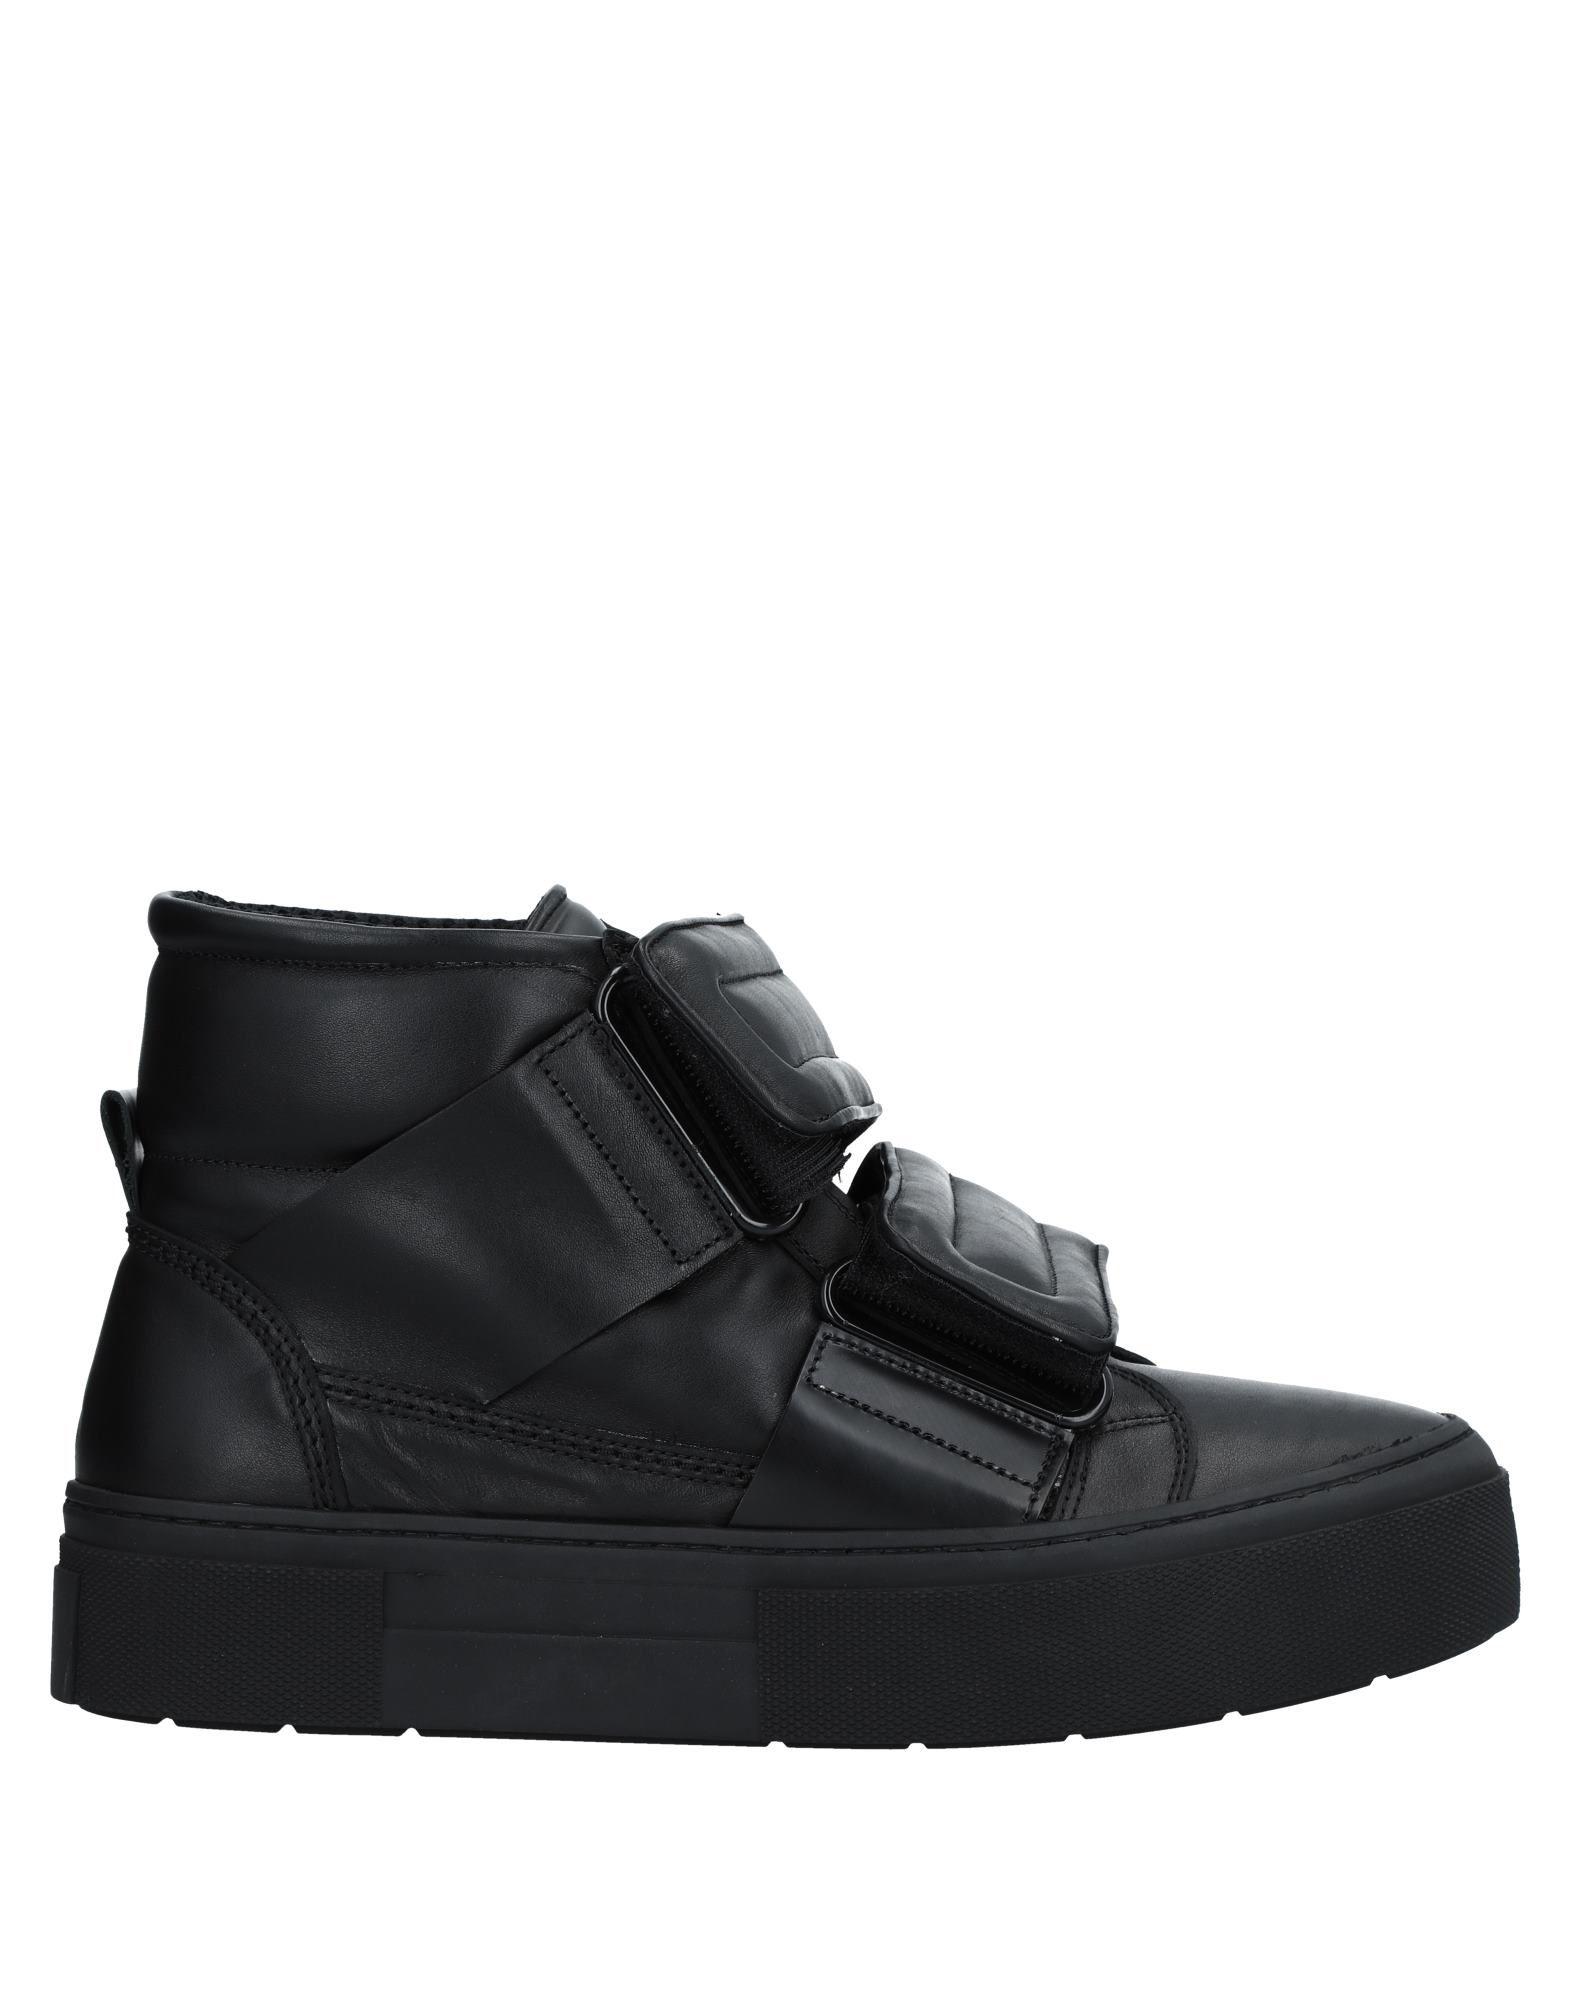 A buon mercato Sneakers O.X.S. Donna - 11533658ER